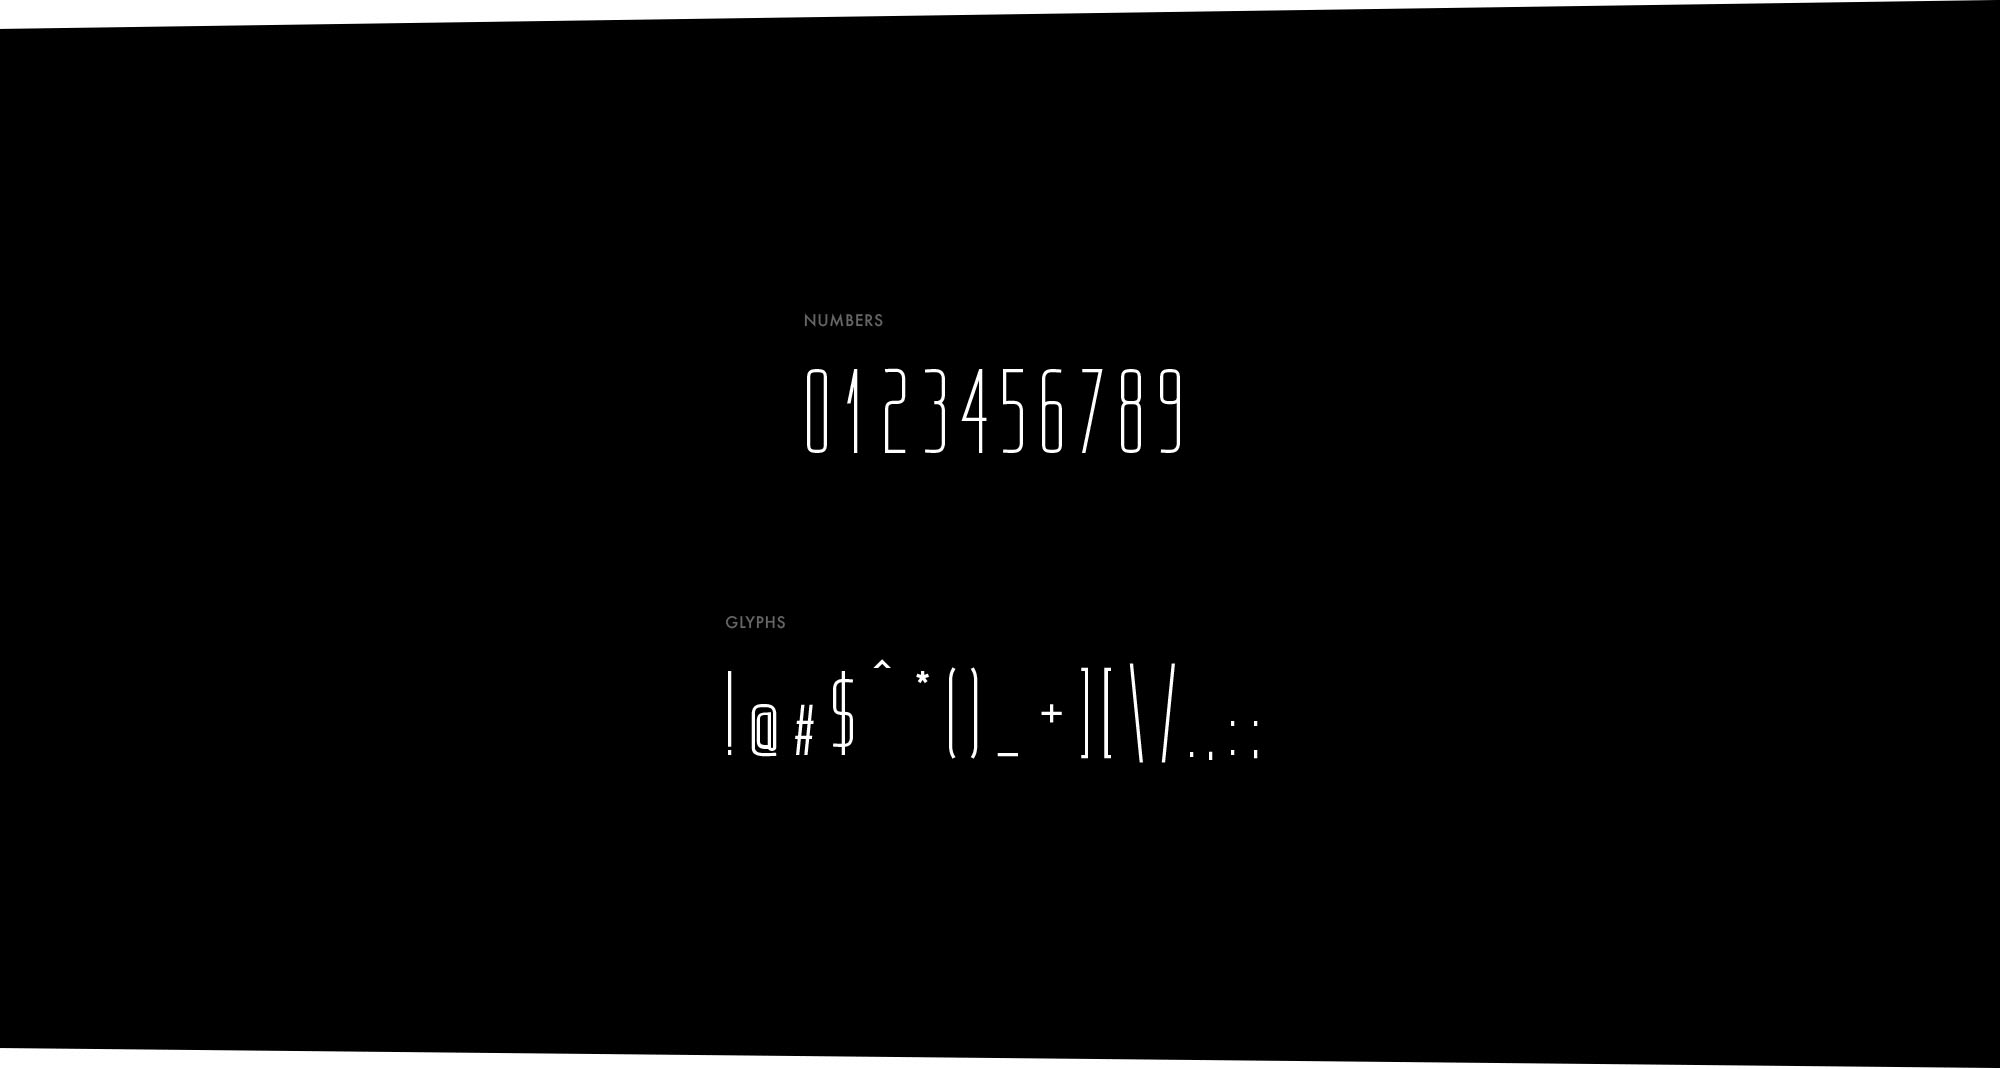 Kompakt Font Numbers & Glyphs